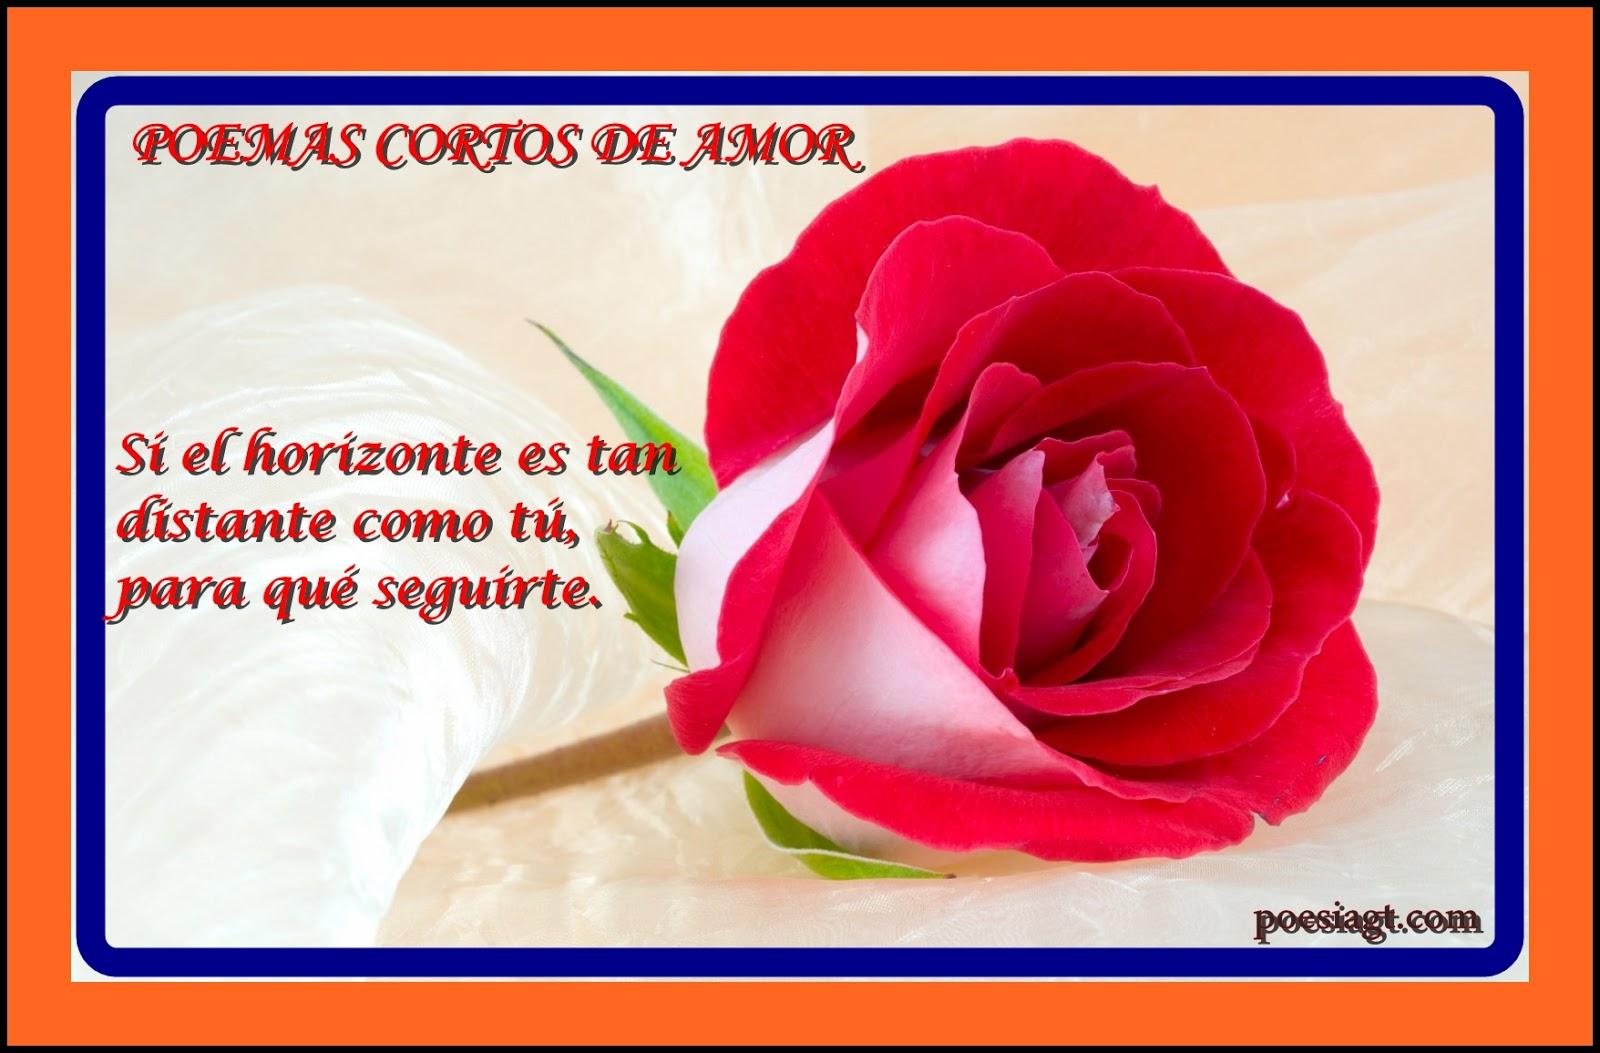 Poemas 2 Postales Animadas De Amor Atomicoche Com Portal Pelautscom Frozen Wallpaper Hd Anna